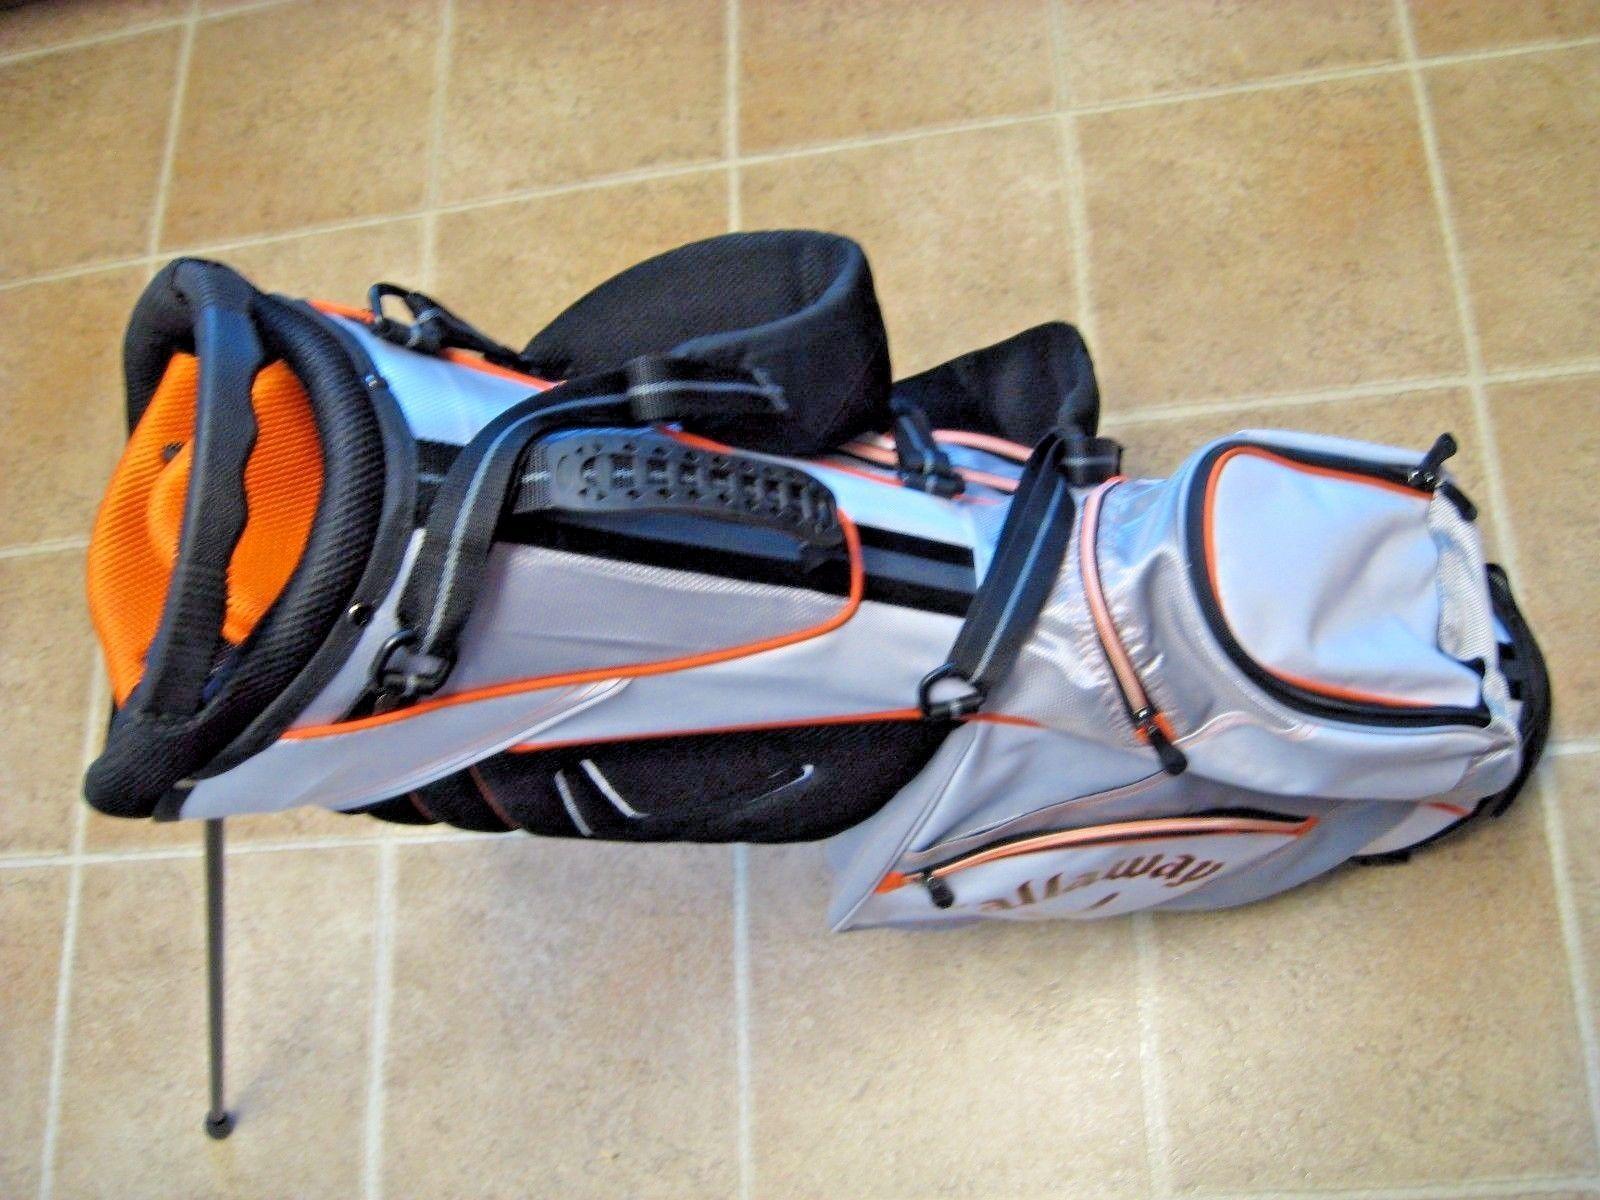 Callaway Lite Golf Bag w/ Stand / 7-way Top / Red / White / Titanium / Top